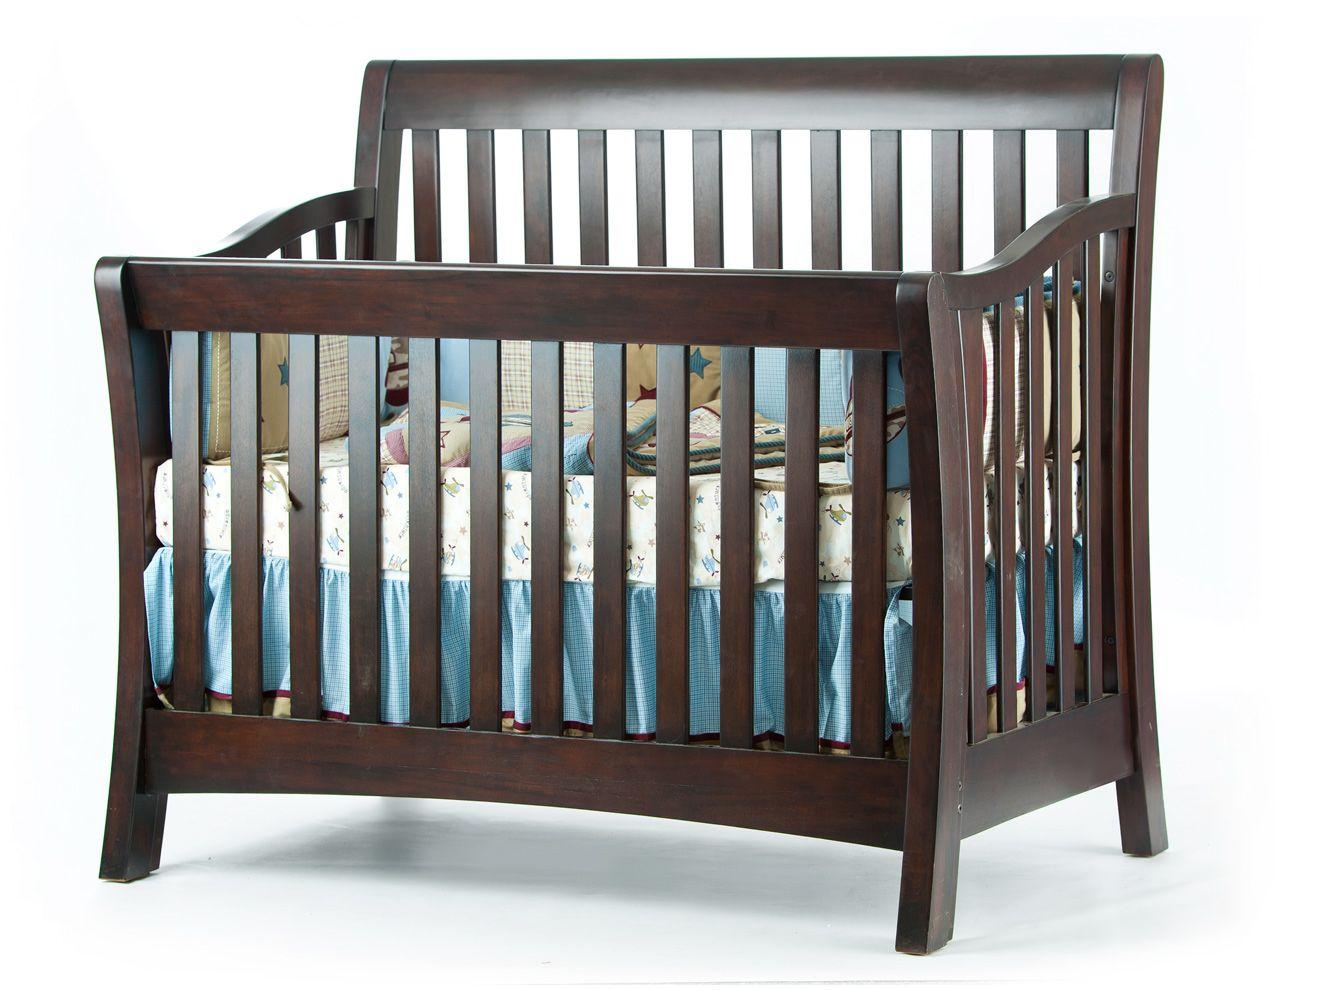 Munire Urban Lifetime Crib Furniture Baby Room Furniture Cribs